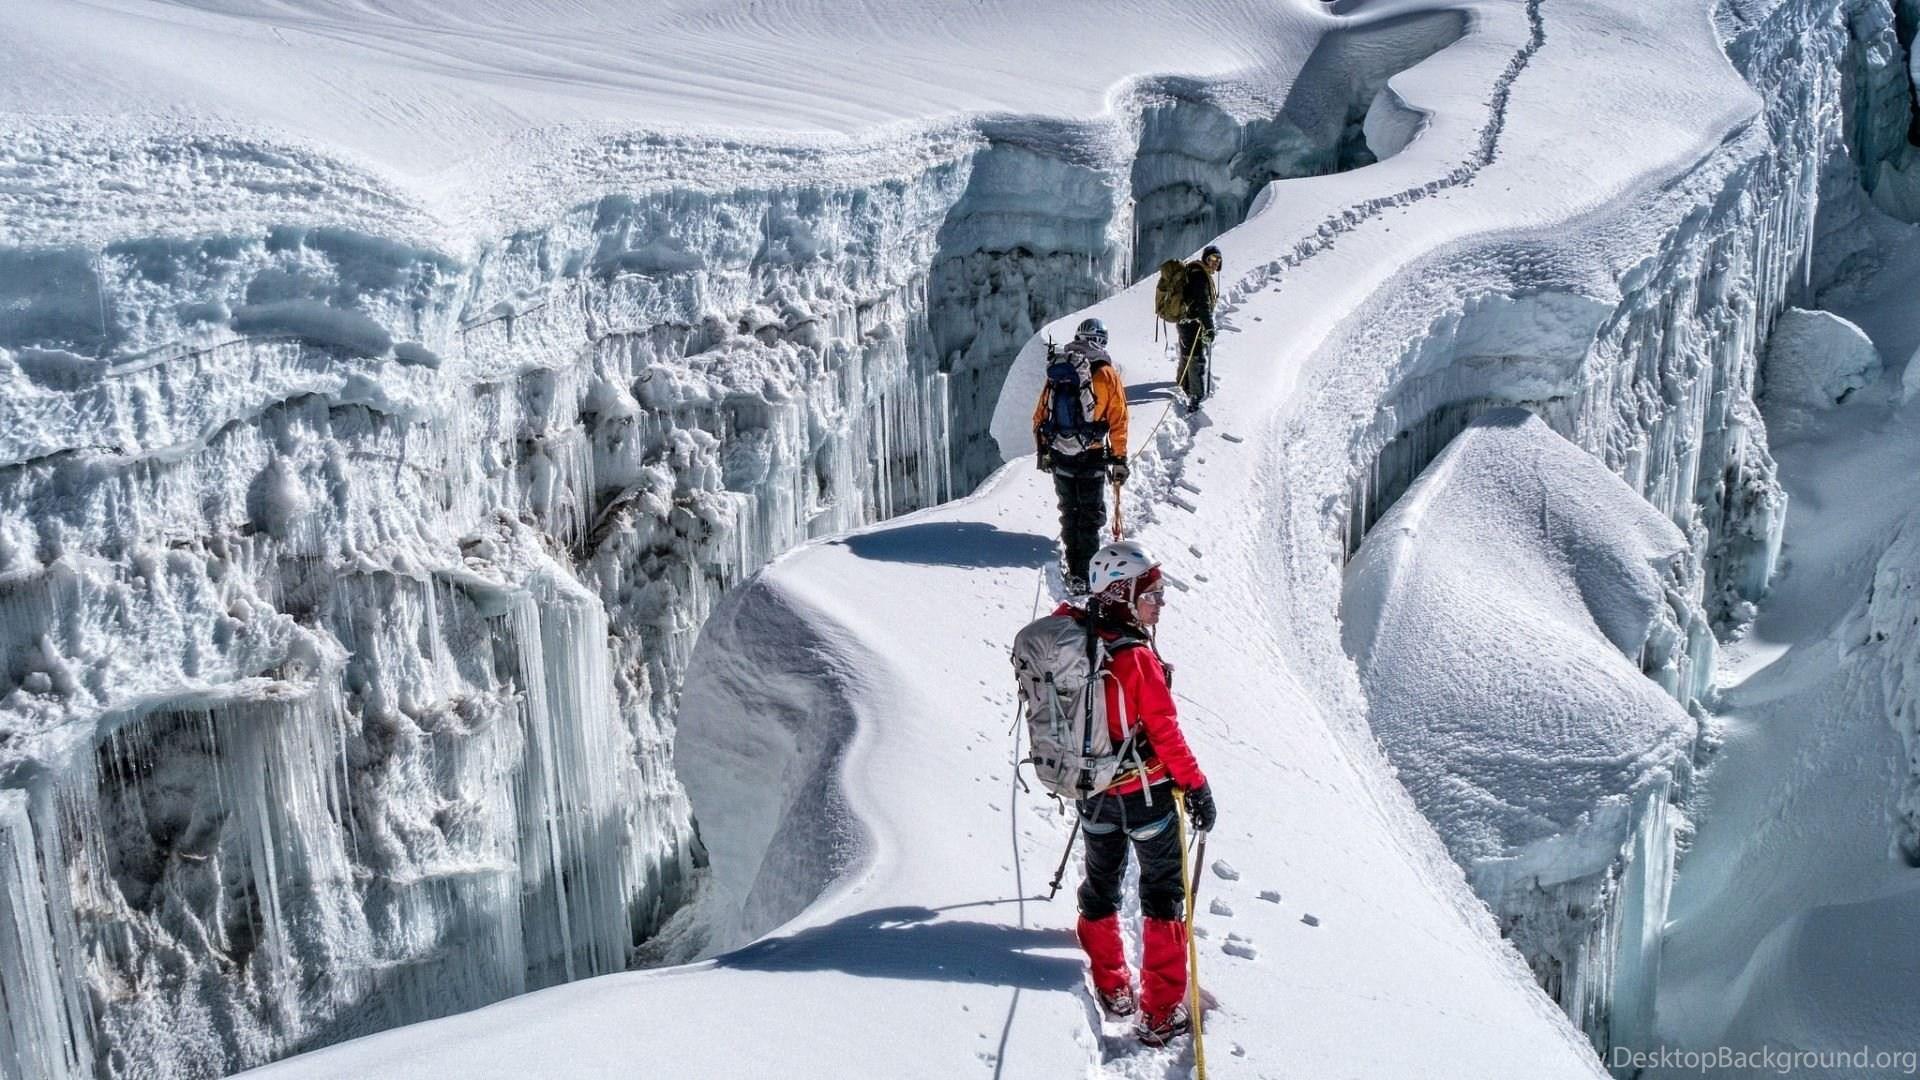 Climbing Dangerous Rock Climbers HD Wallpapers Download